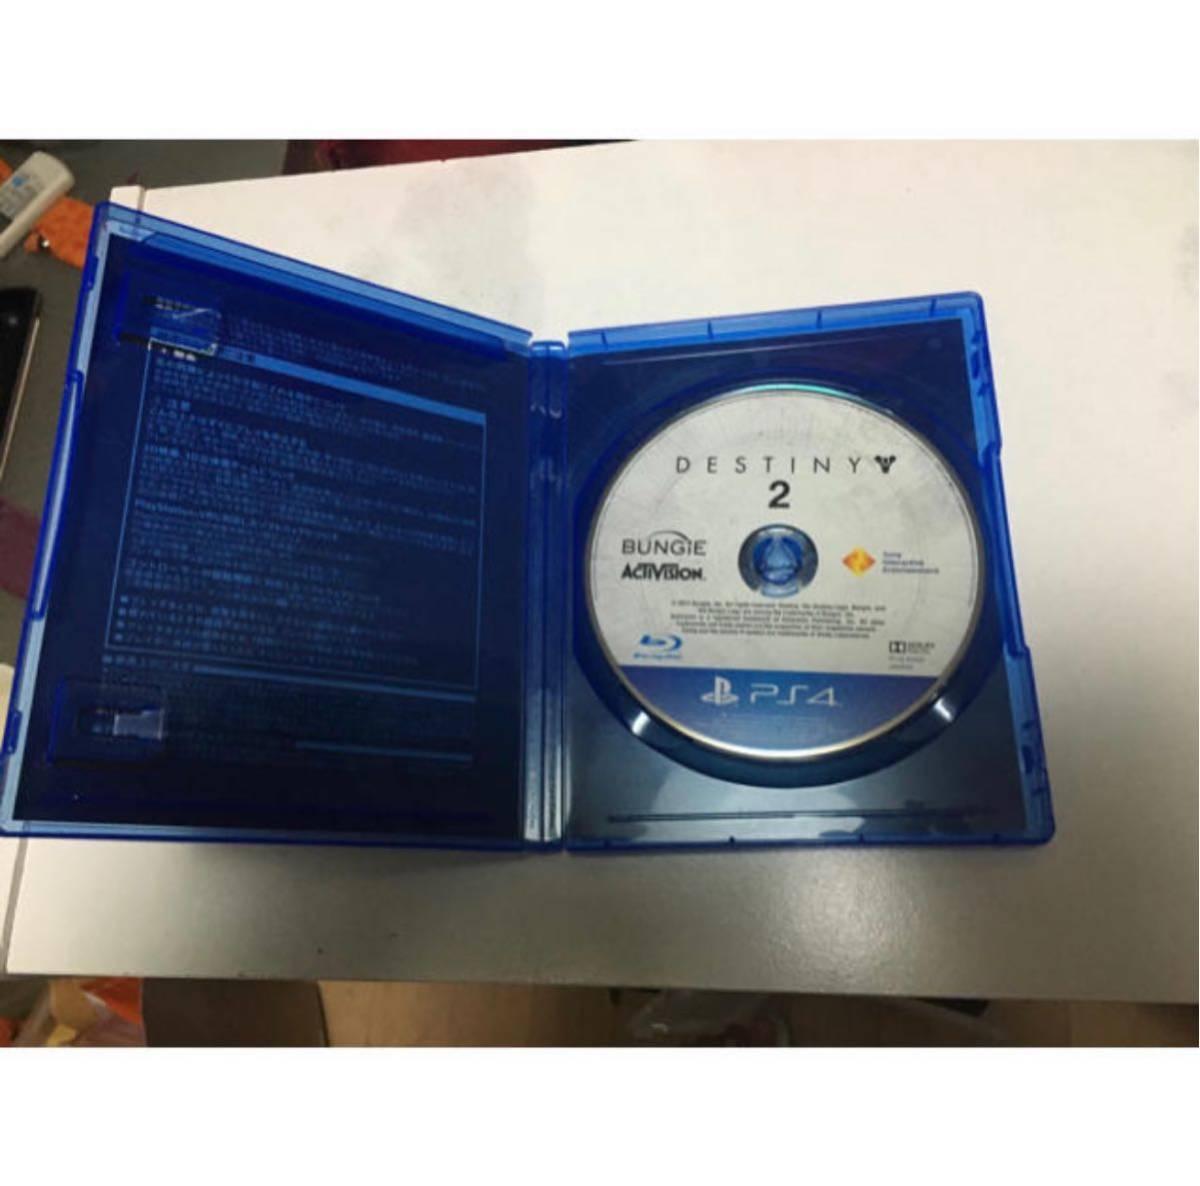 【PS4】 Destiny [通常版] Destiny(デスティニー) 1&2 PS4